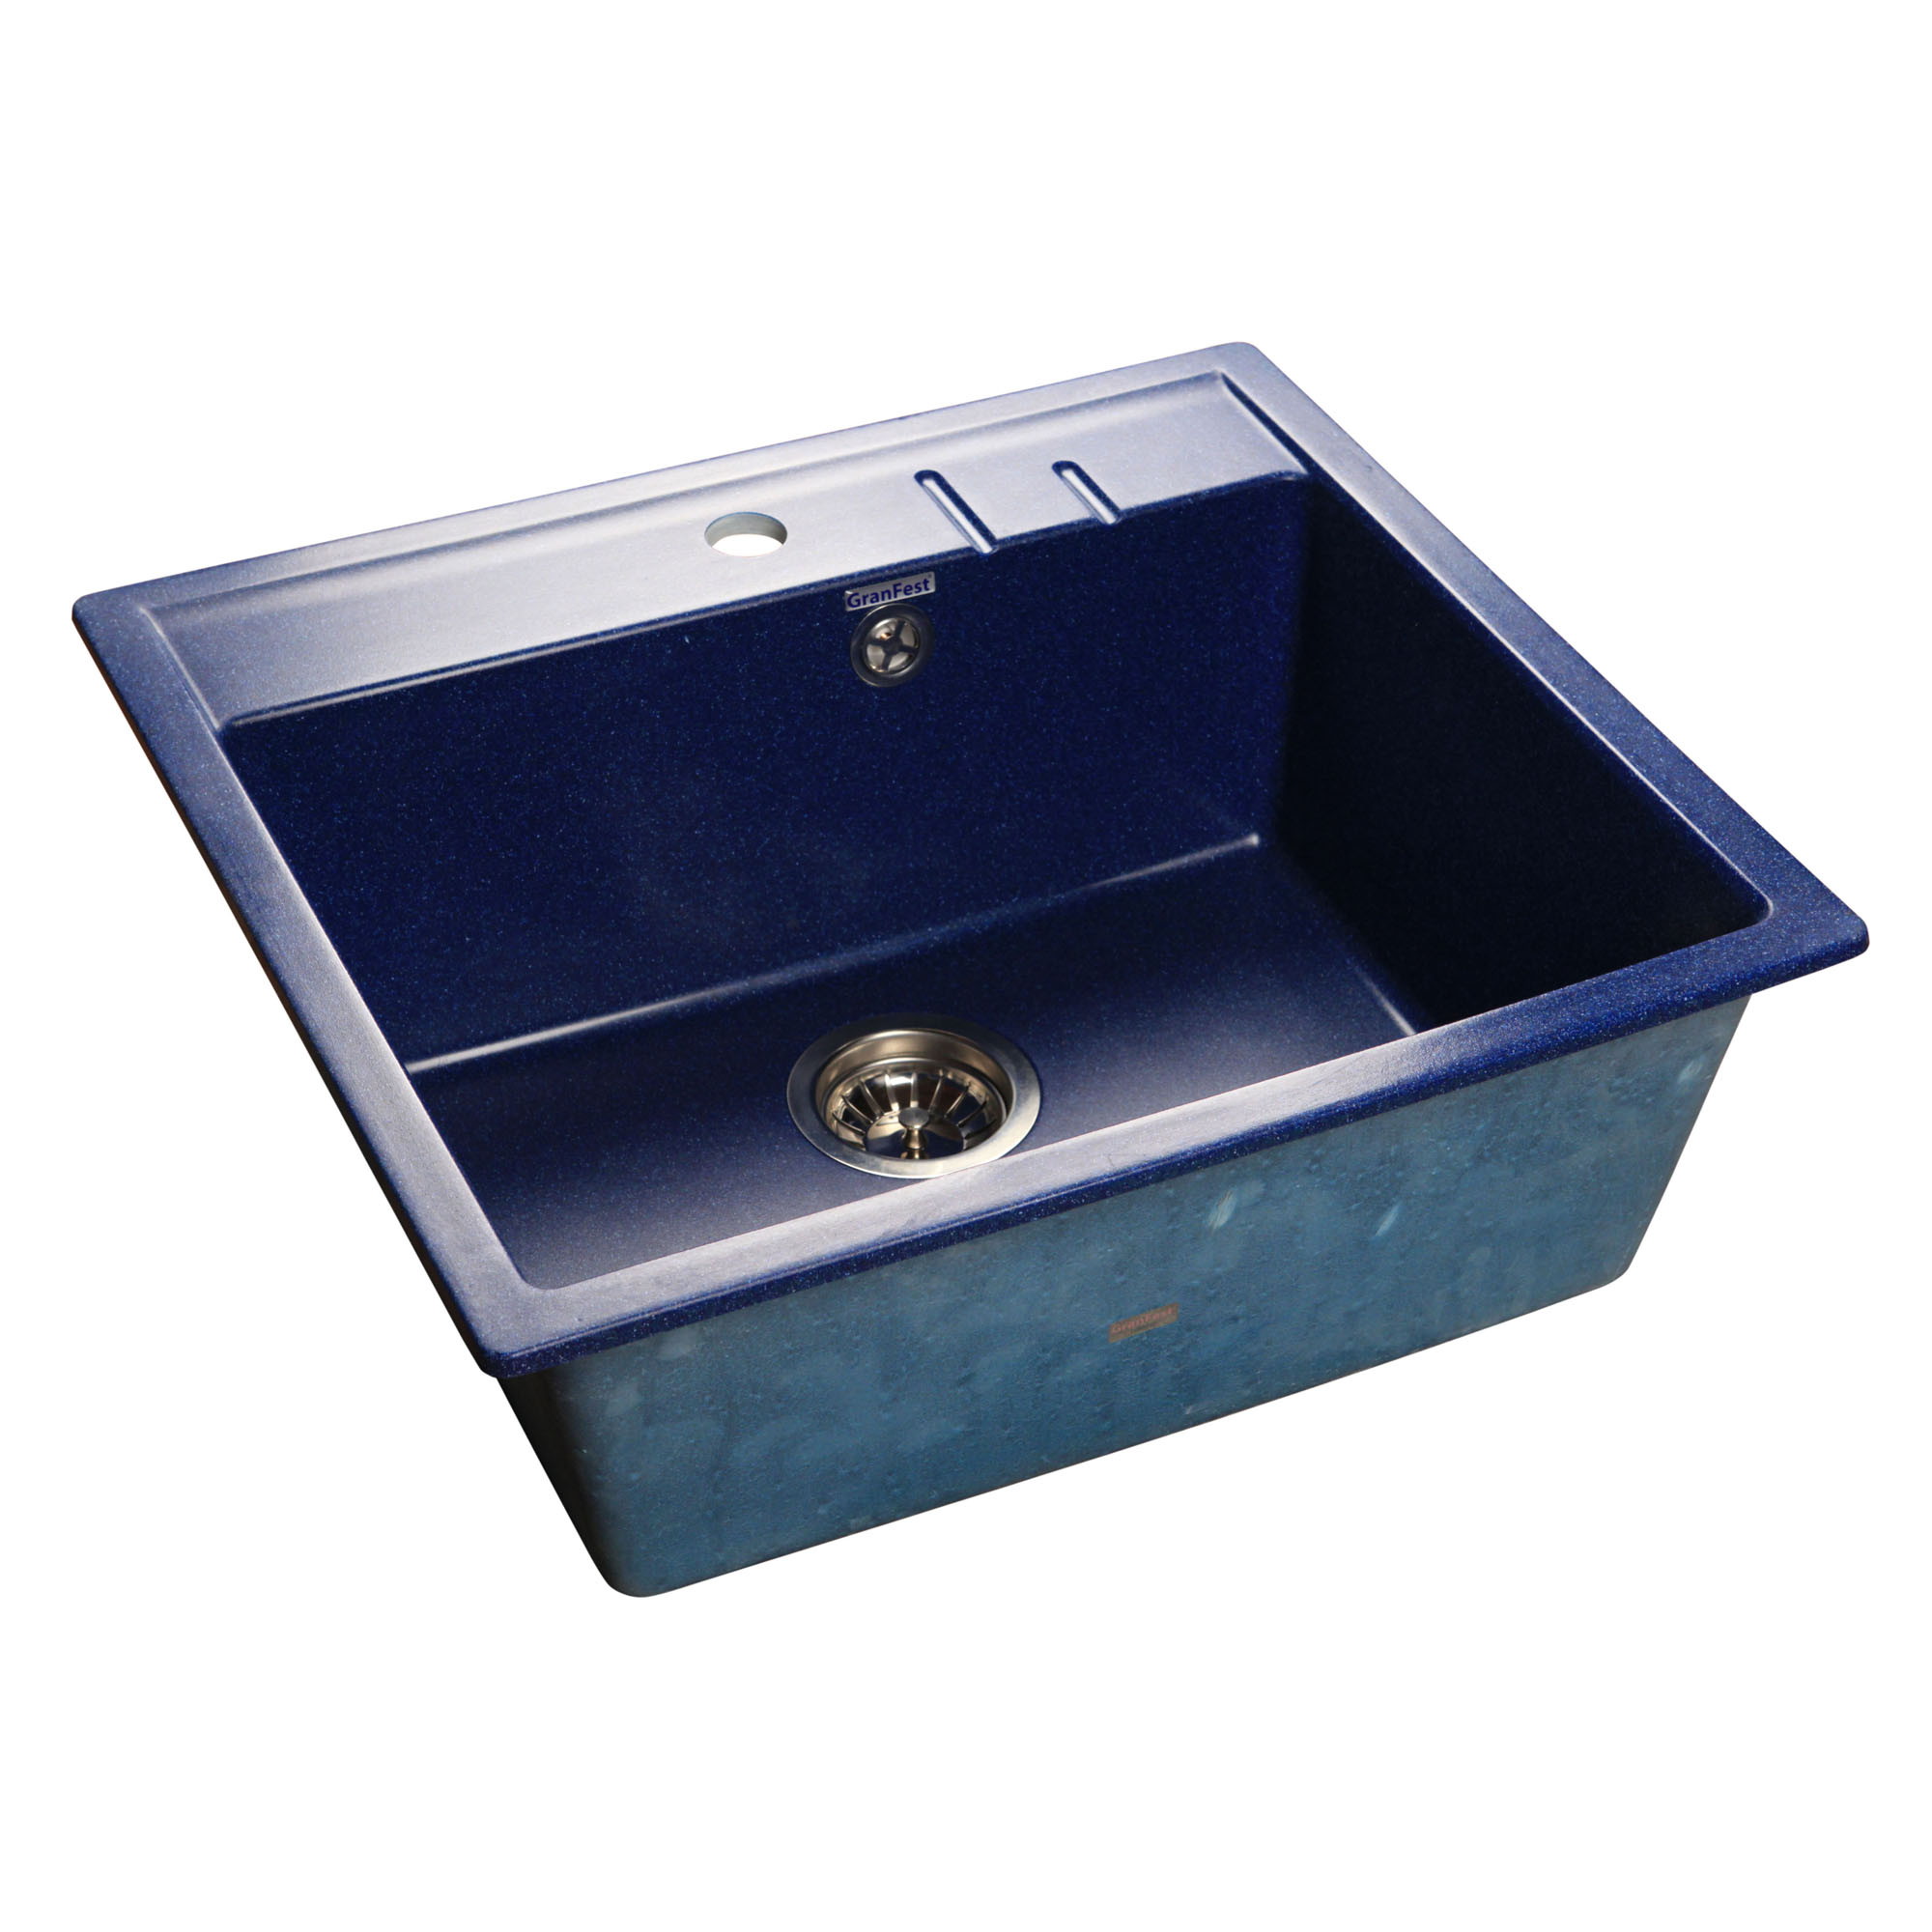 Кухонная мойка GranFest Quadro GF-Q560 синий мойка кухонная granfest гранит 565x510 gf q560 терракот